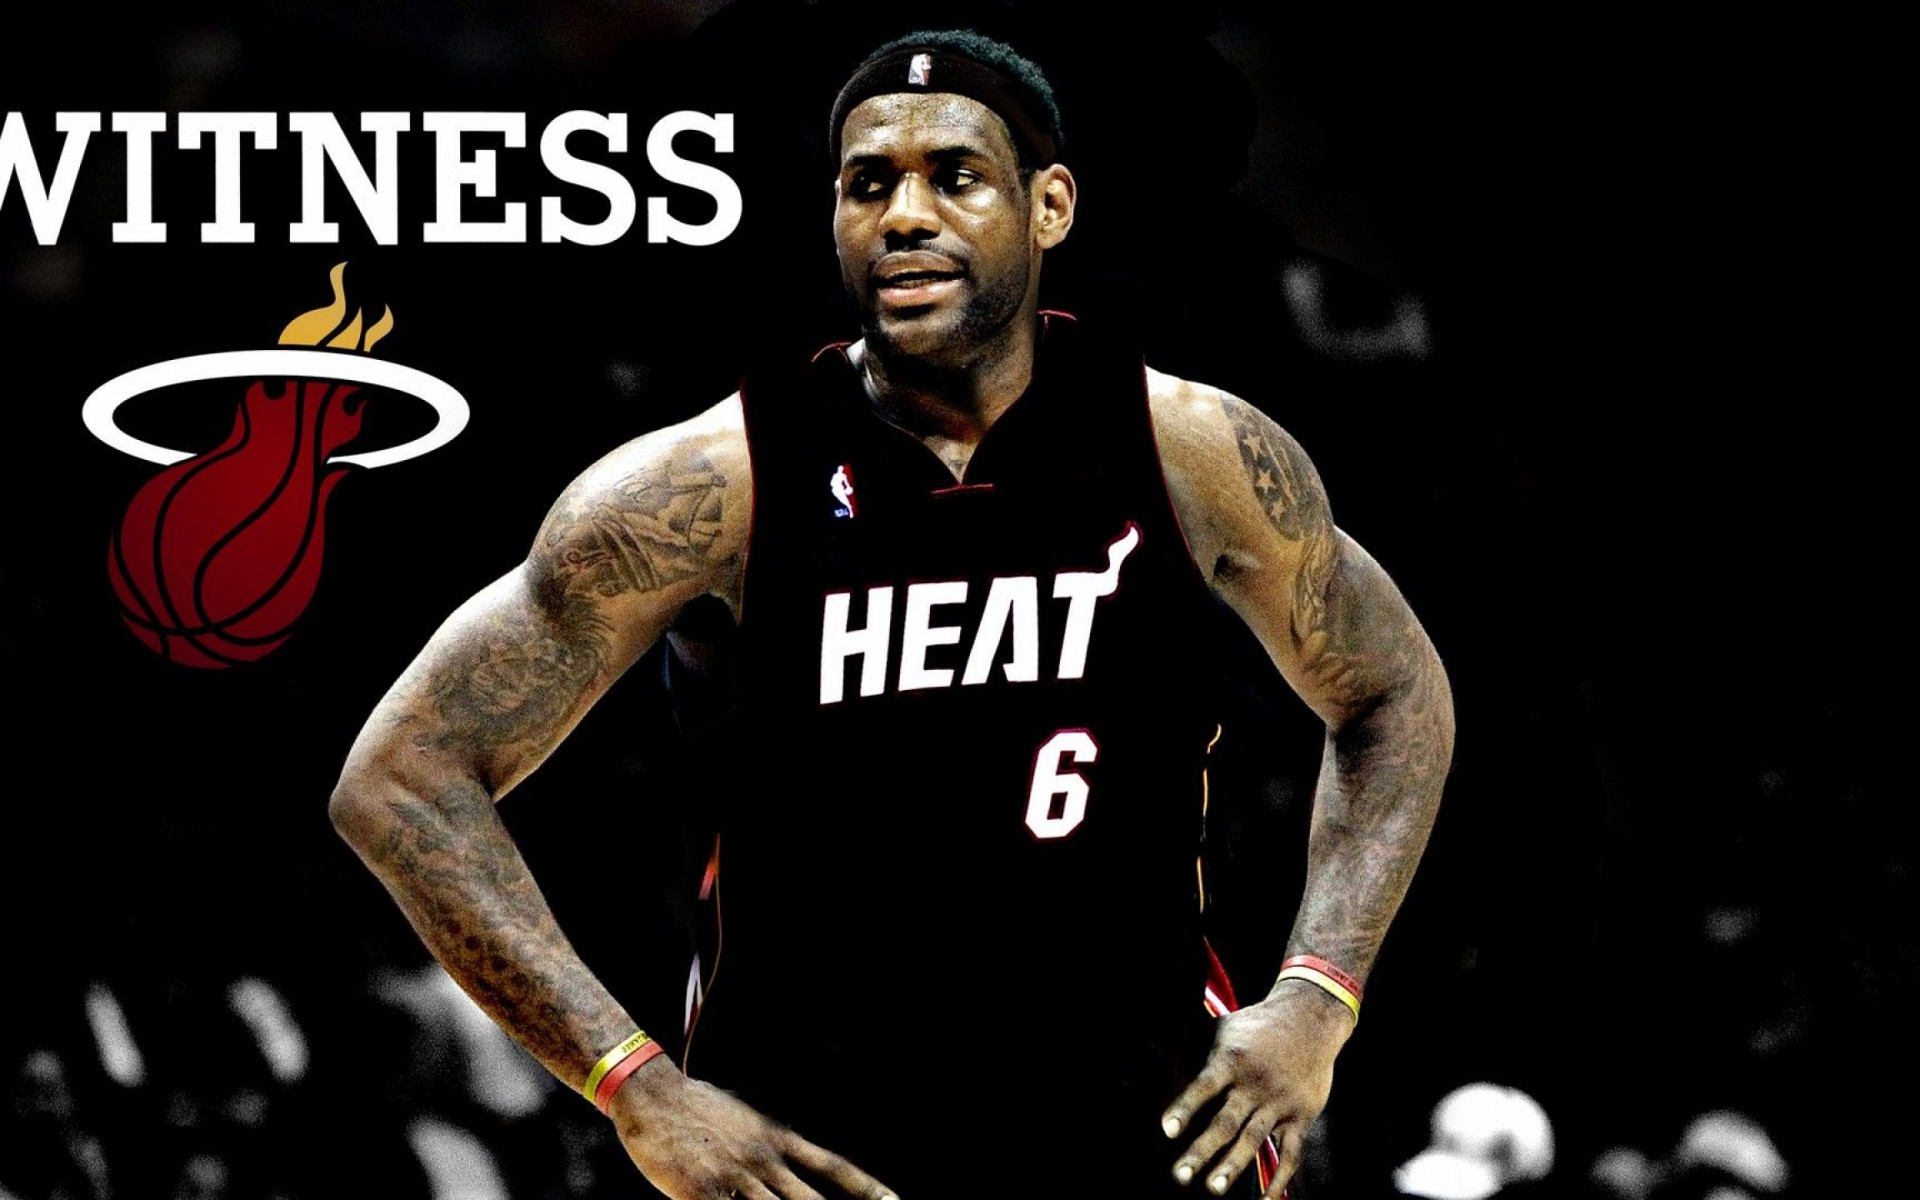 Download LeBron James Miami Heat Witness Wallpaper Image id 6308 1920x1200